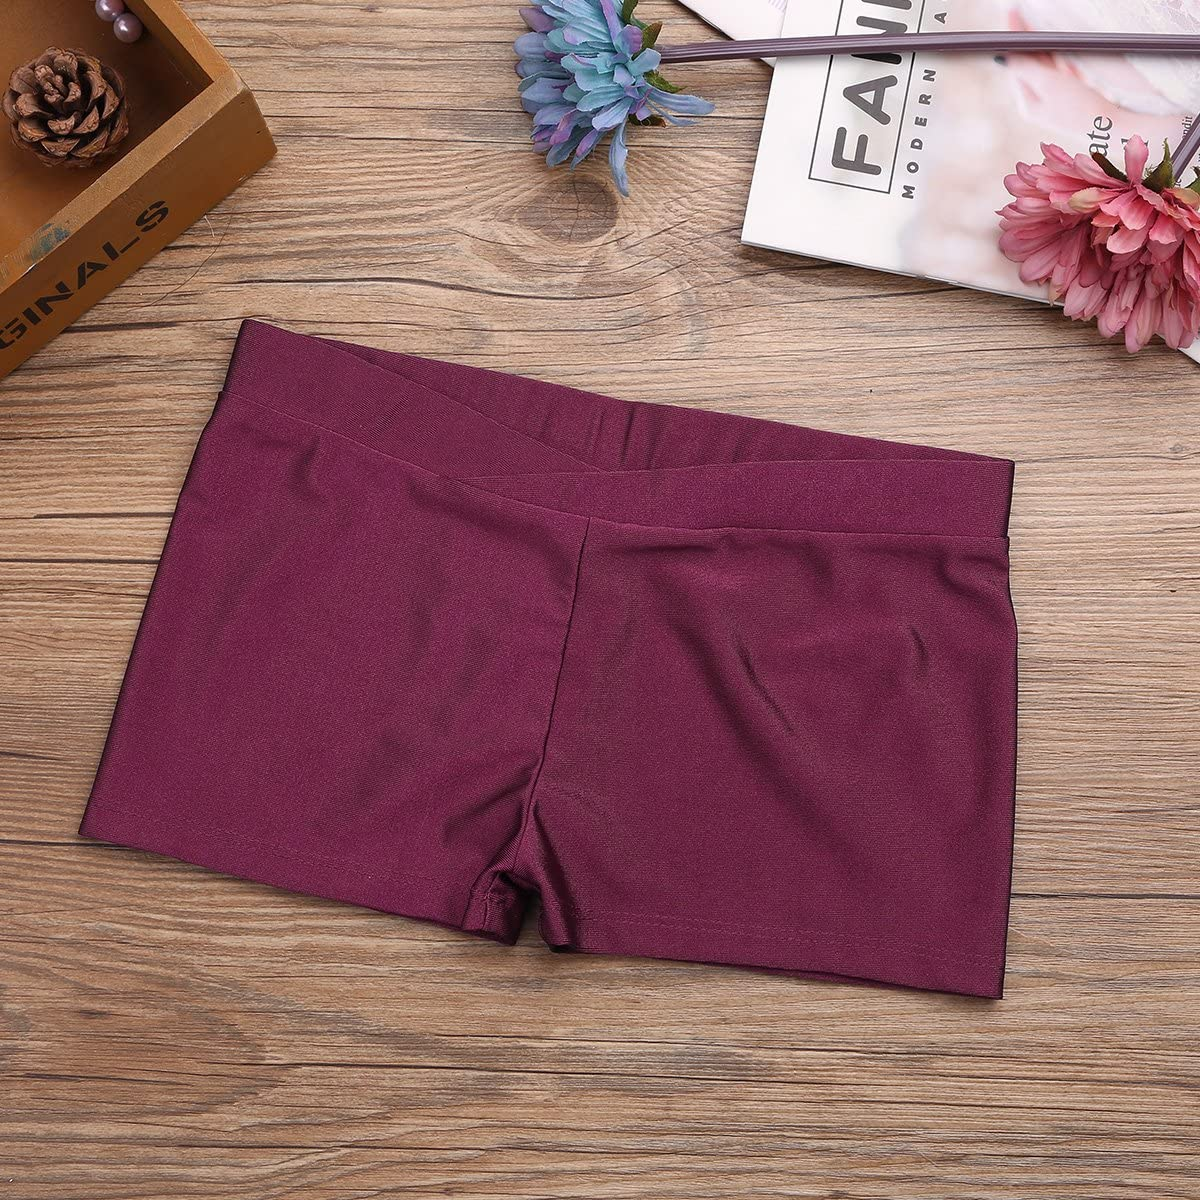 ranrann Kids Girls Safety Dance Dress Basic Sports Shorts Hot Pants Dancing Bike Pants Workout Bottoms